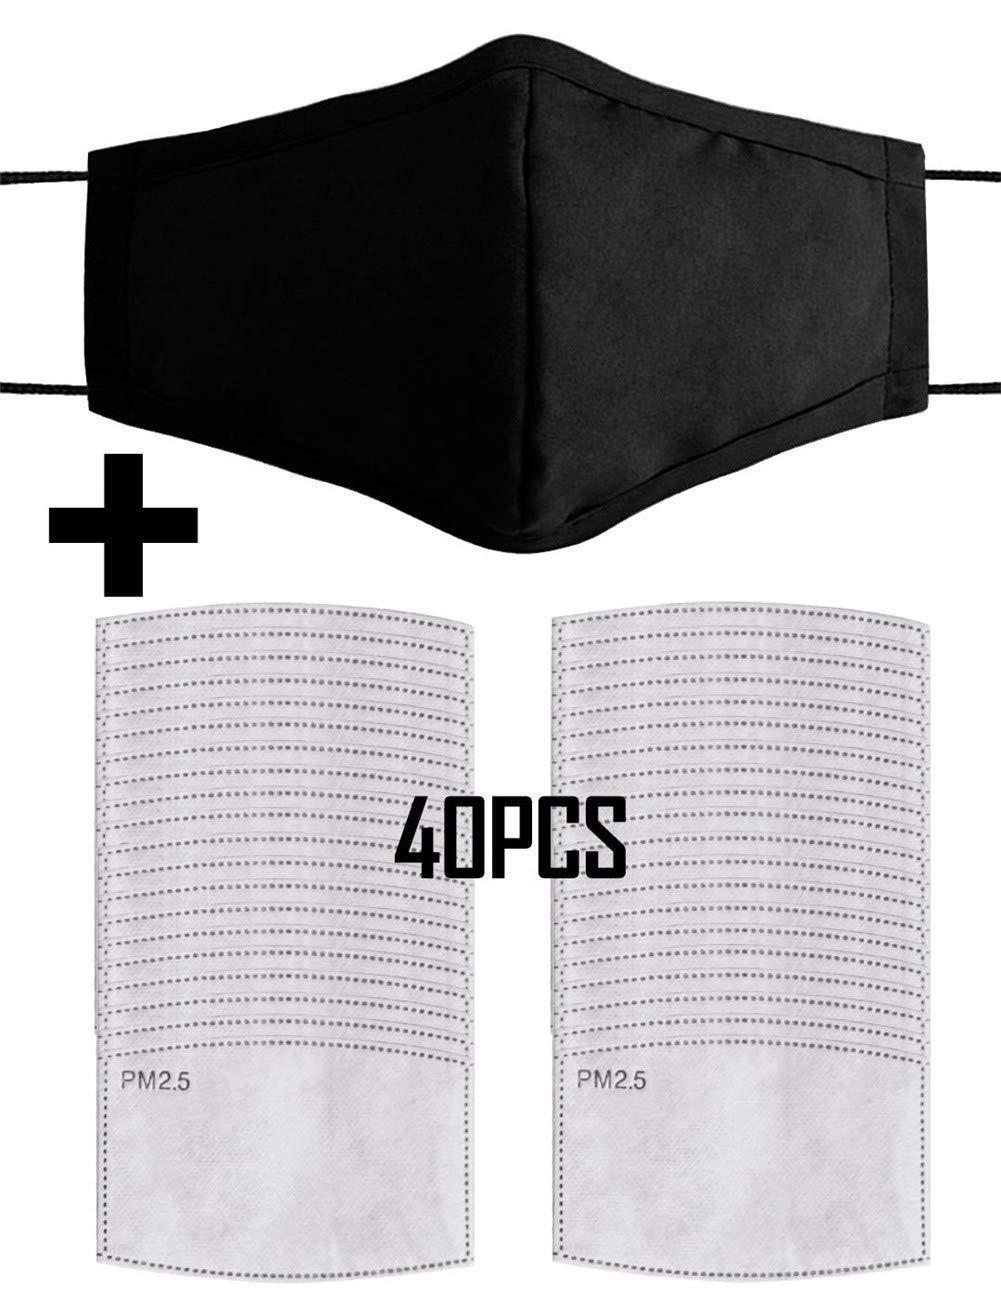 40PCS Reutilizable PM2.5 Polvo máscara Protectora Lavable Anti Haze máscara de Polvo Fino Máscara